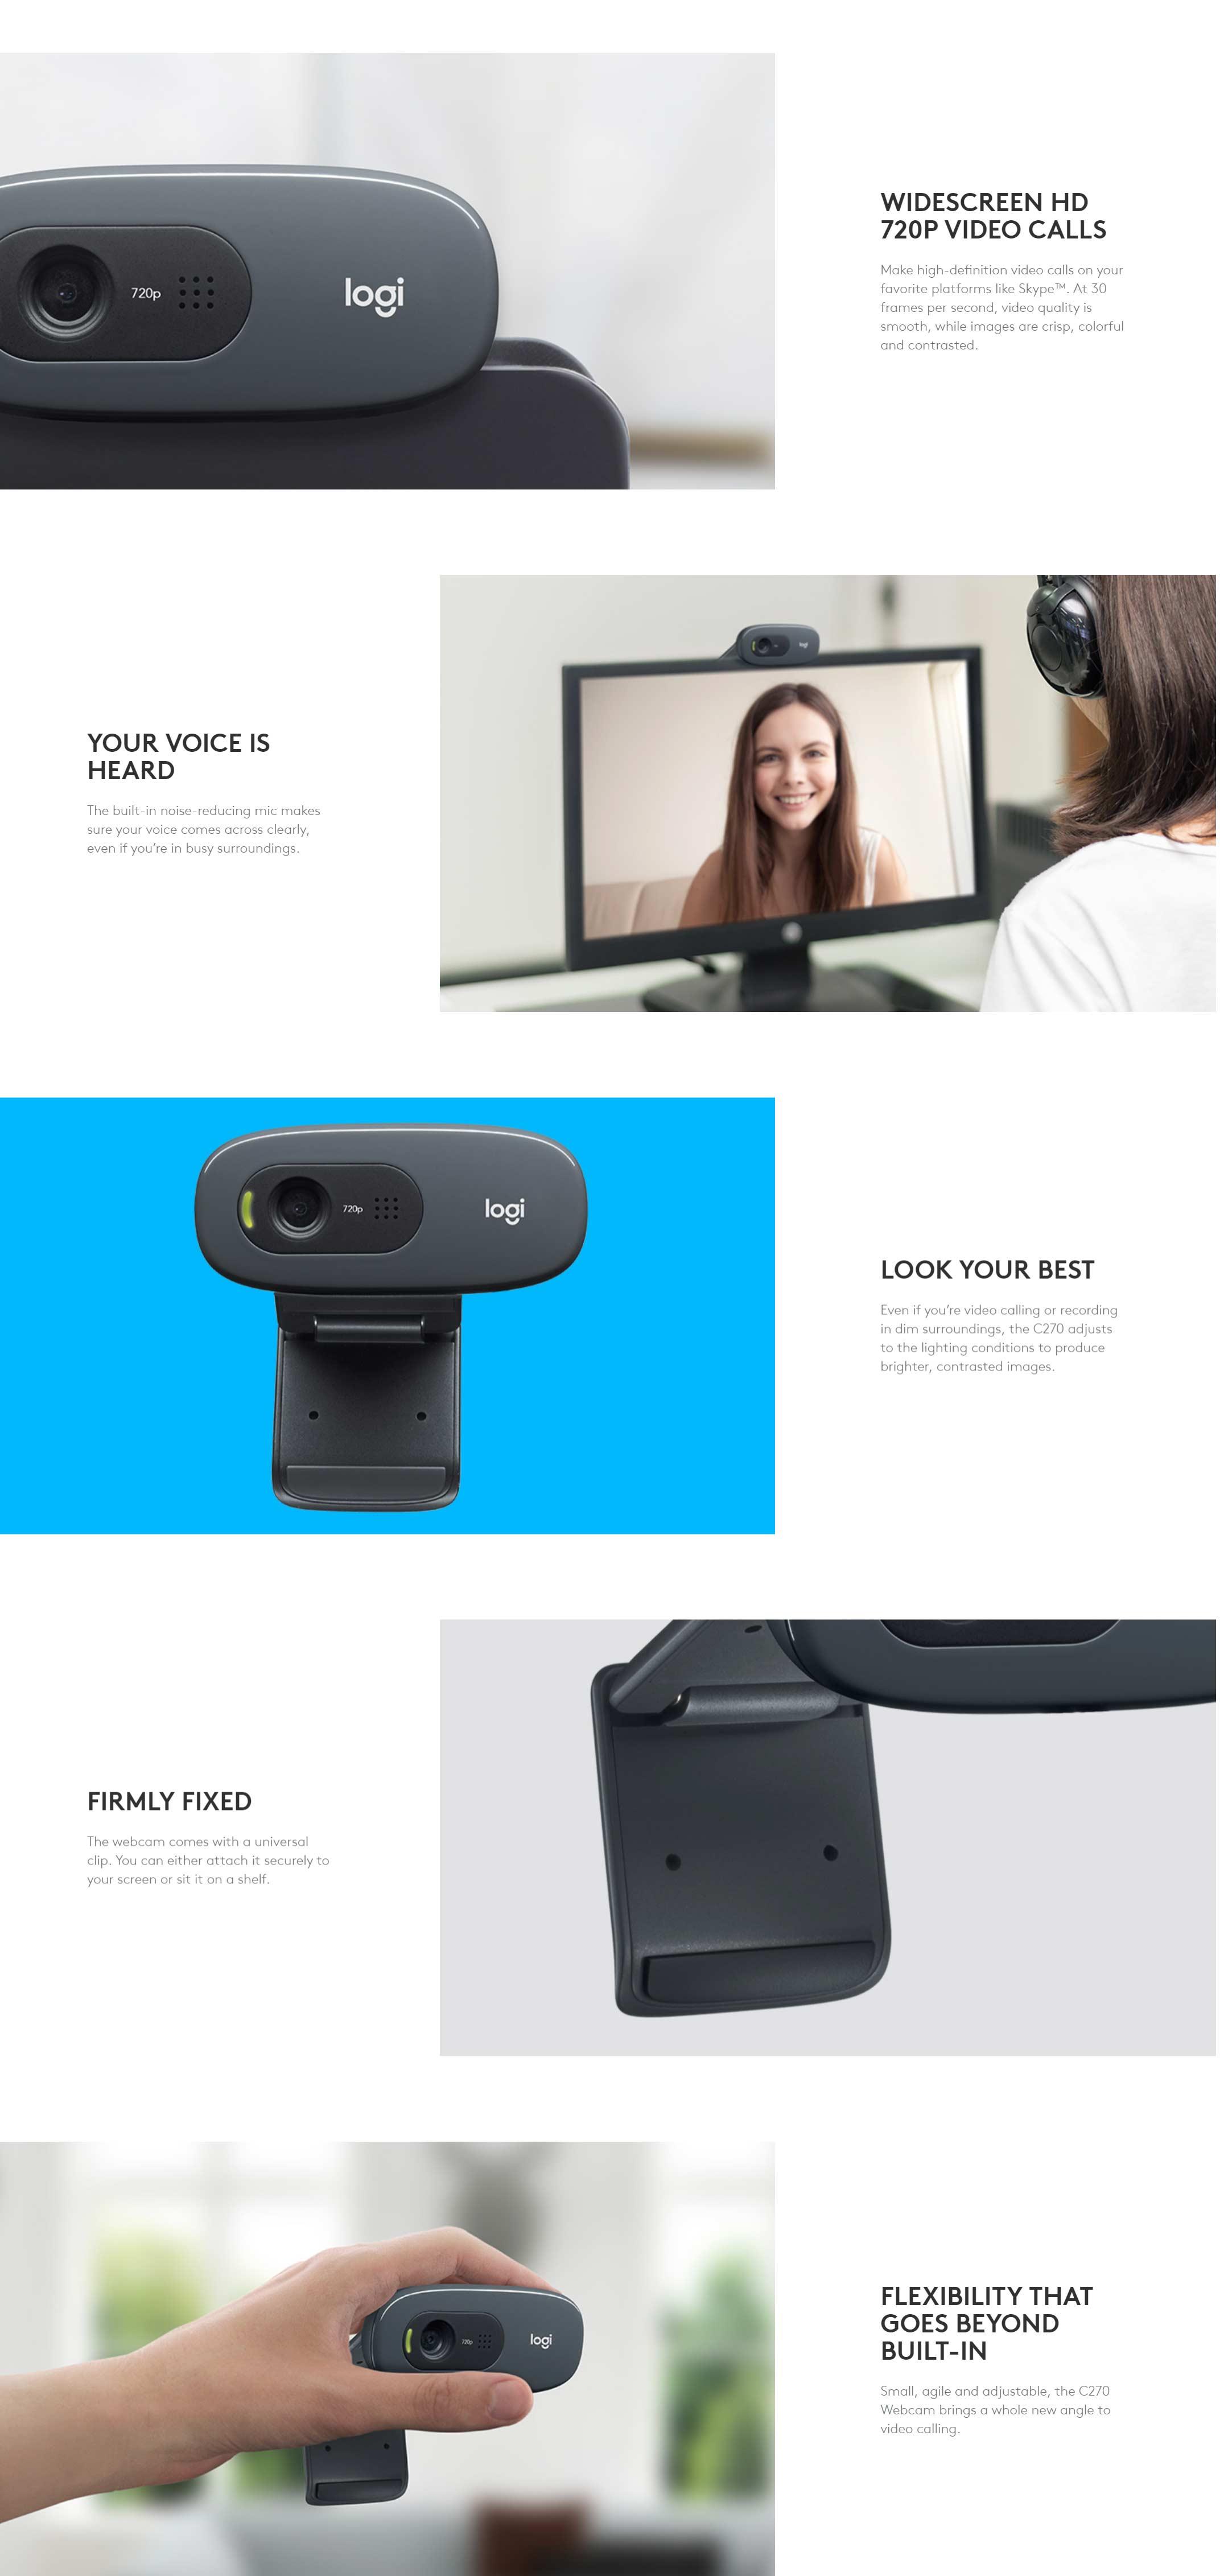 FireShot-Capture-017---Logitech-C270-HD-Webcam,-720p-Video-with-Built-in-Mic-&-Lighting-Corr_---www.jpg